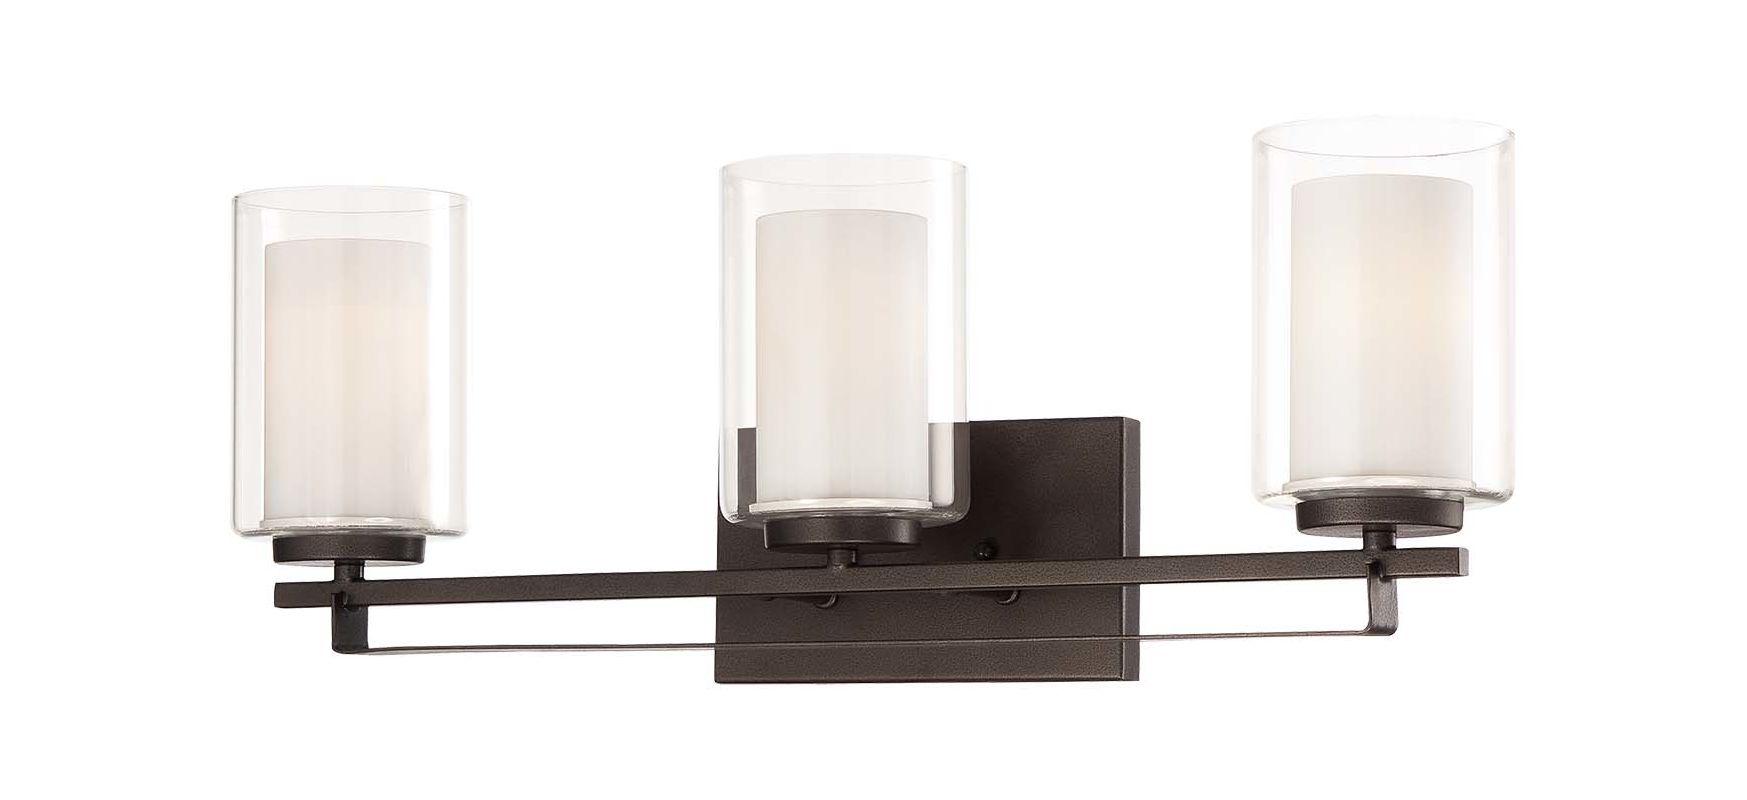 Portfolio 3 Light 22 In Brushed Nickel Bowl Vanity Light: Minka Lavery 6103-172 Smoked Iron 3 Light Bathroom Vanity